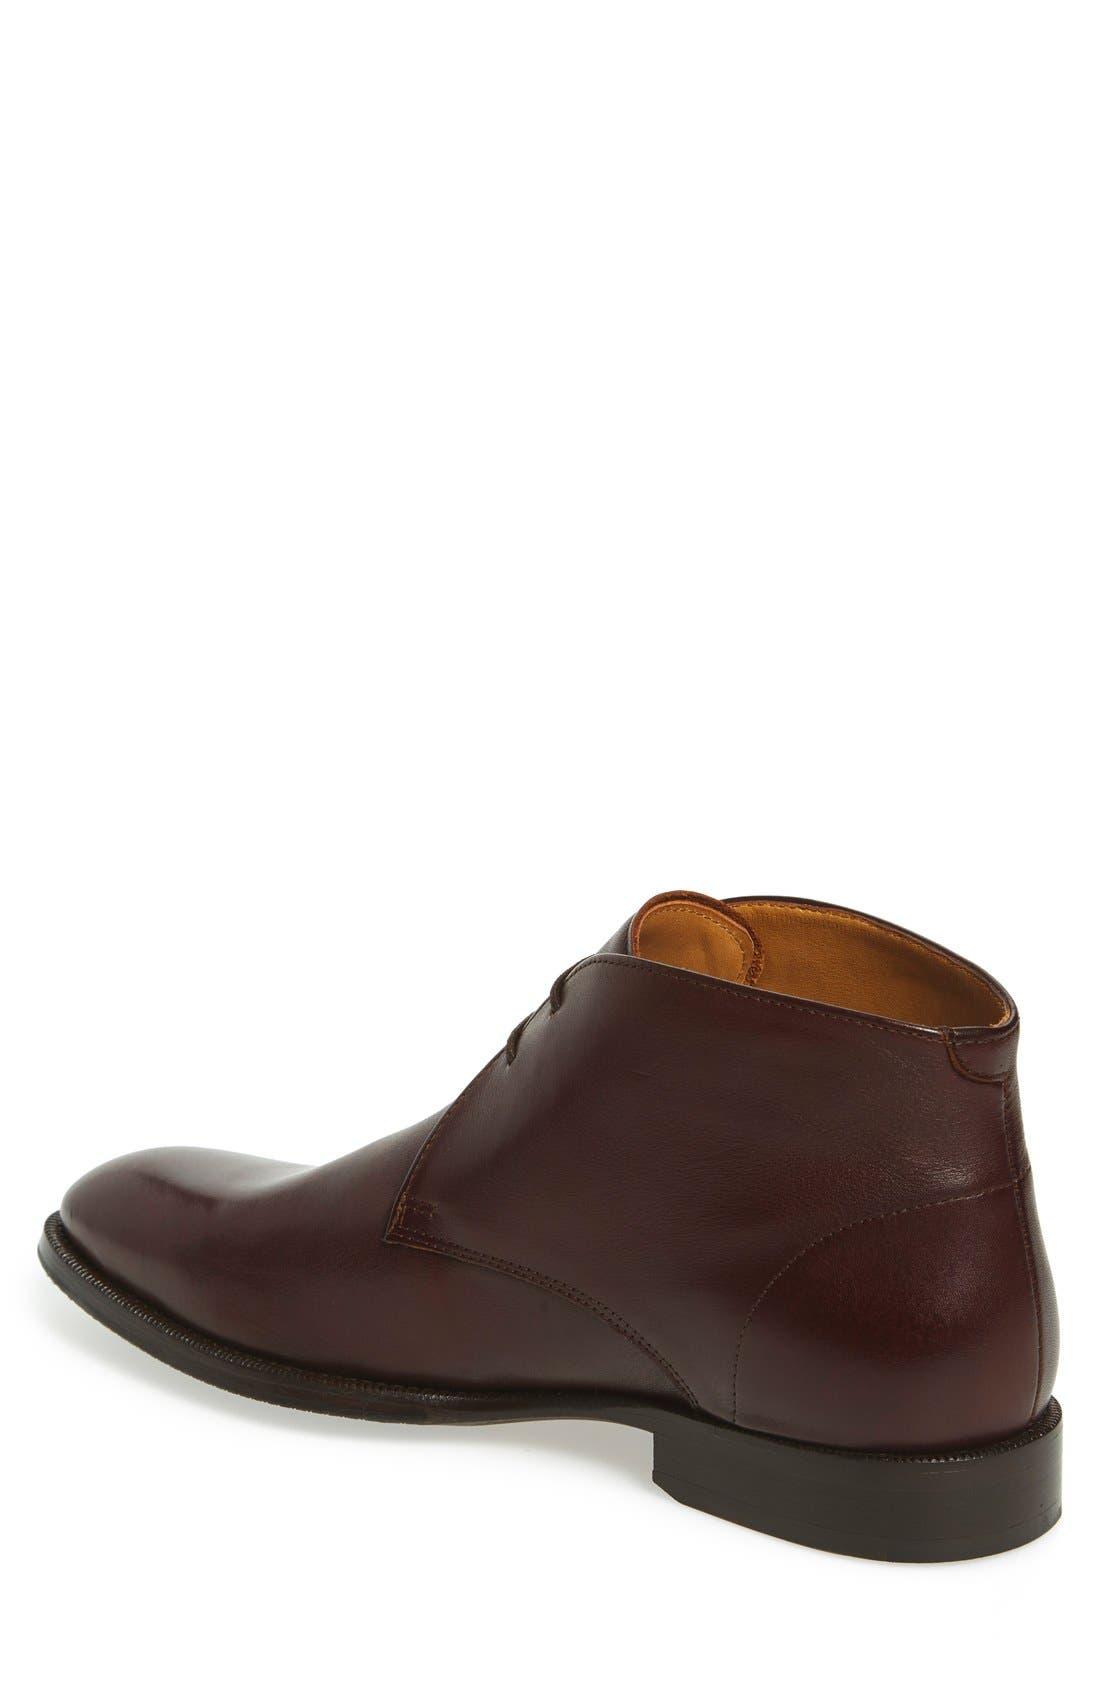 'Branx' Chukka Boot,                             Alternate thumbnail 2, color,                             Dark Brown Leather